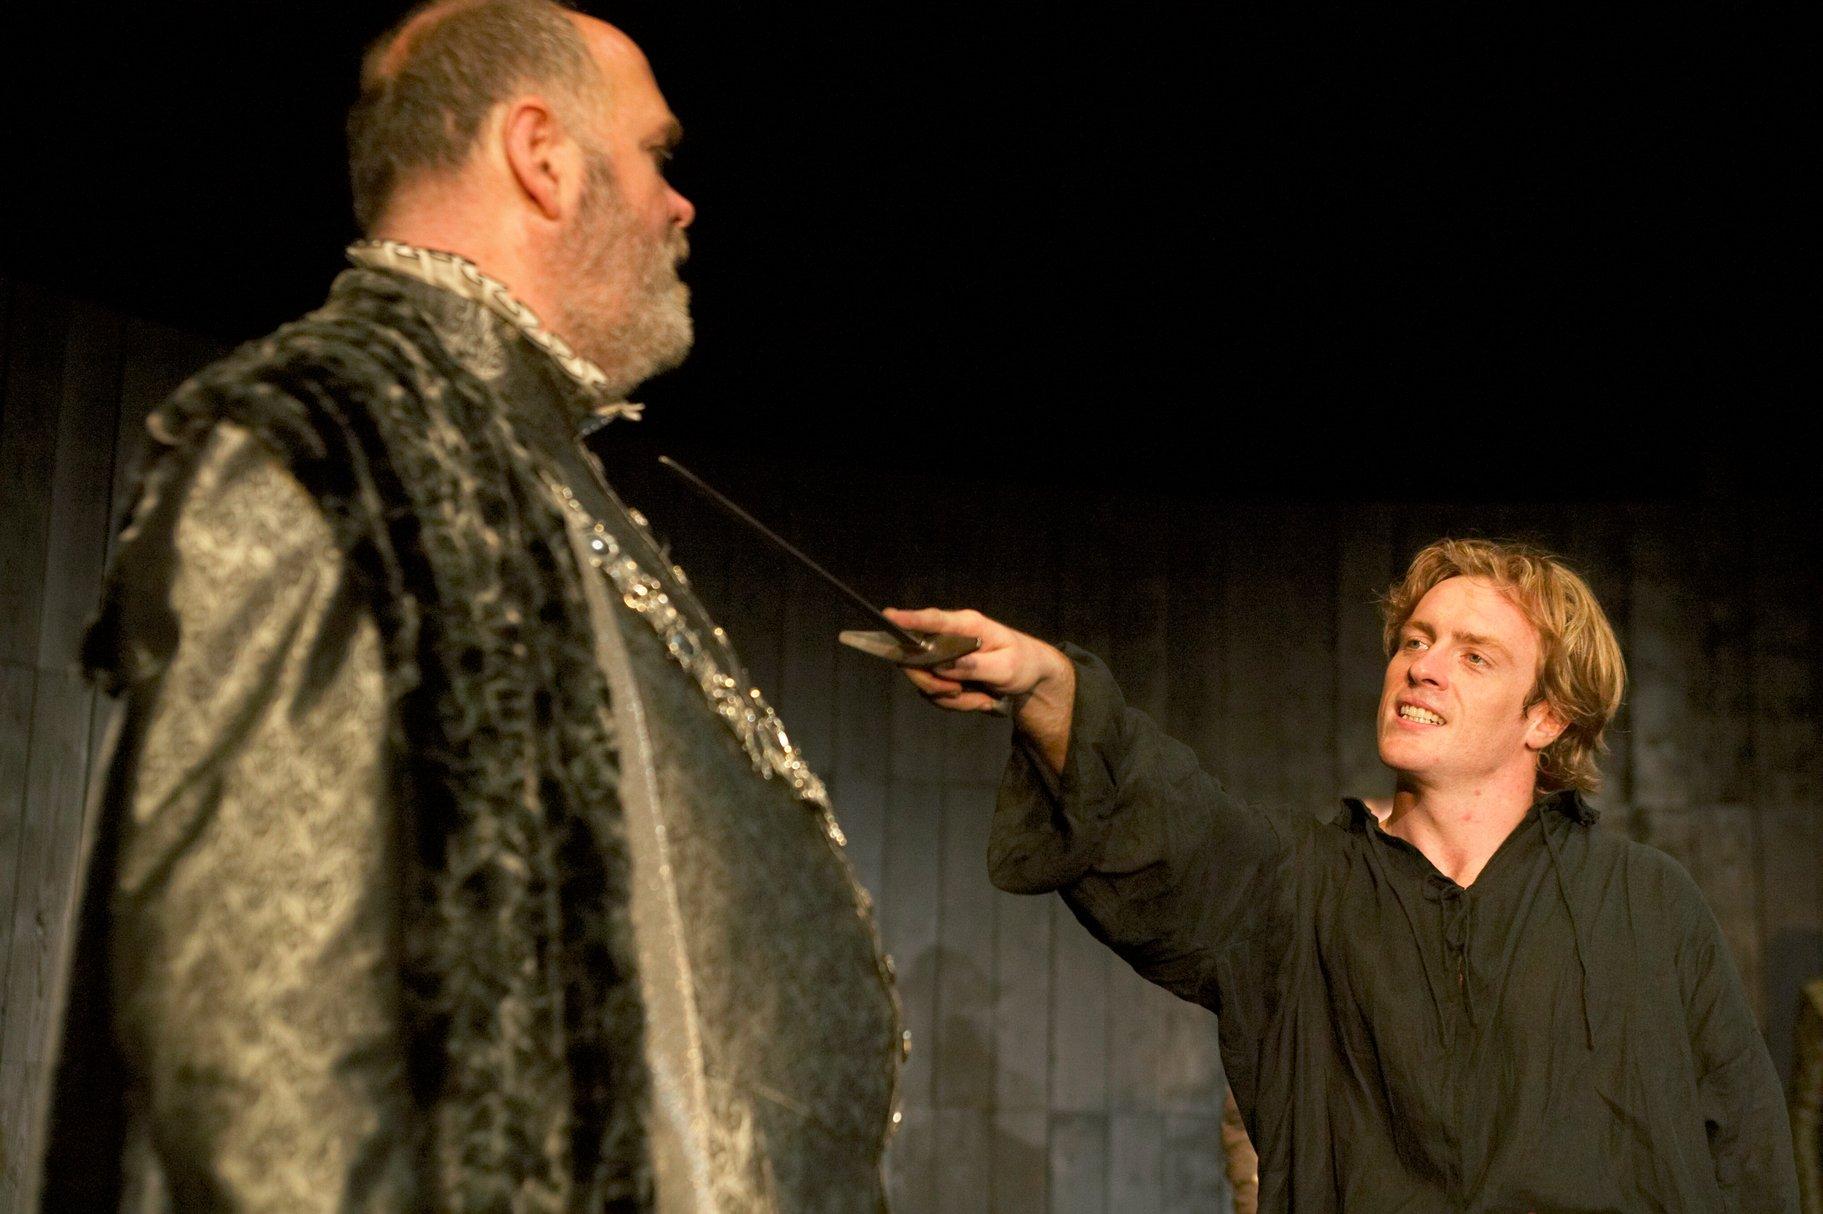 Hamlet holds a sword to Polonius' throat.